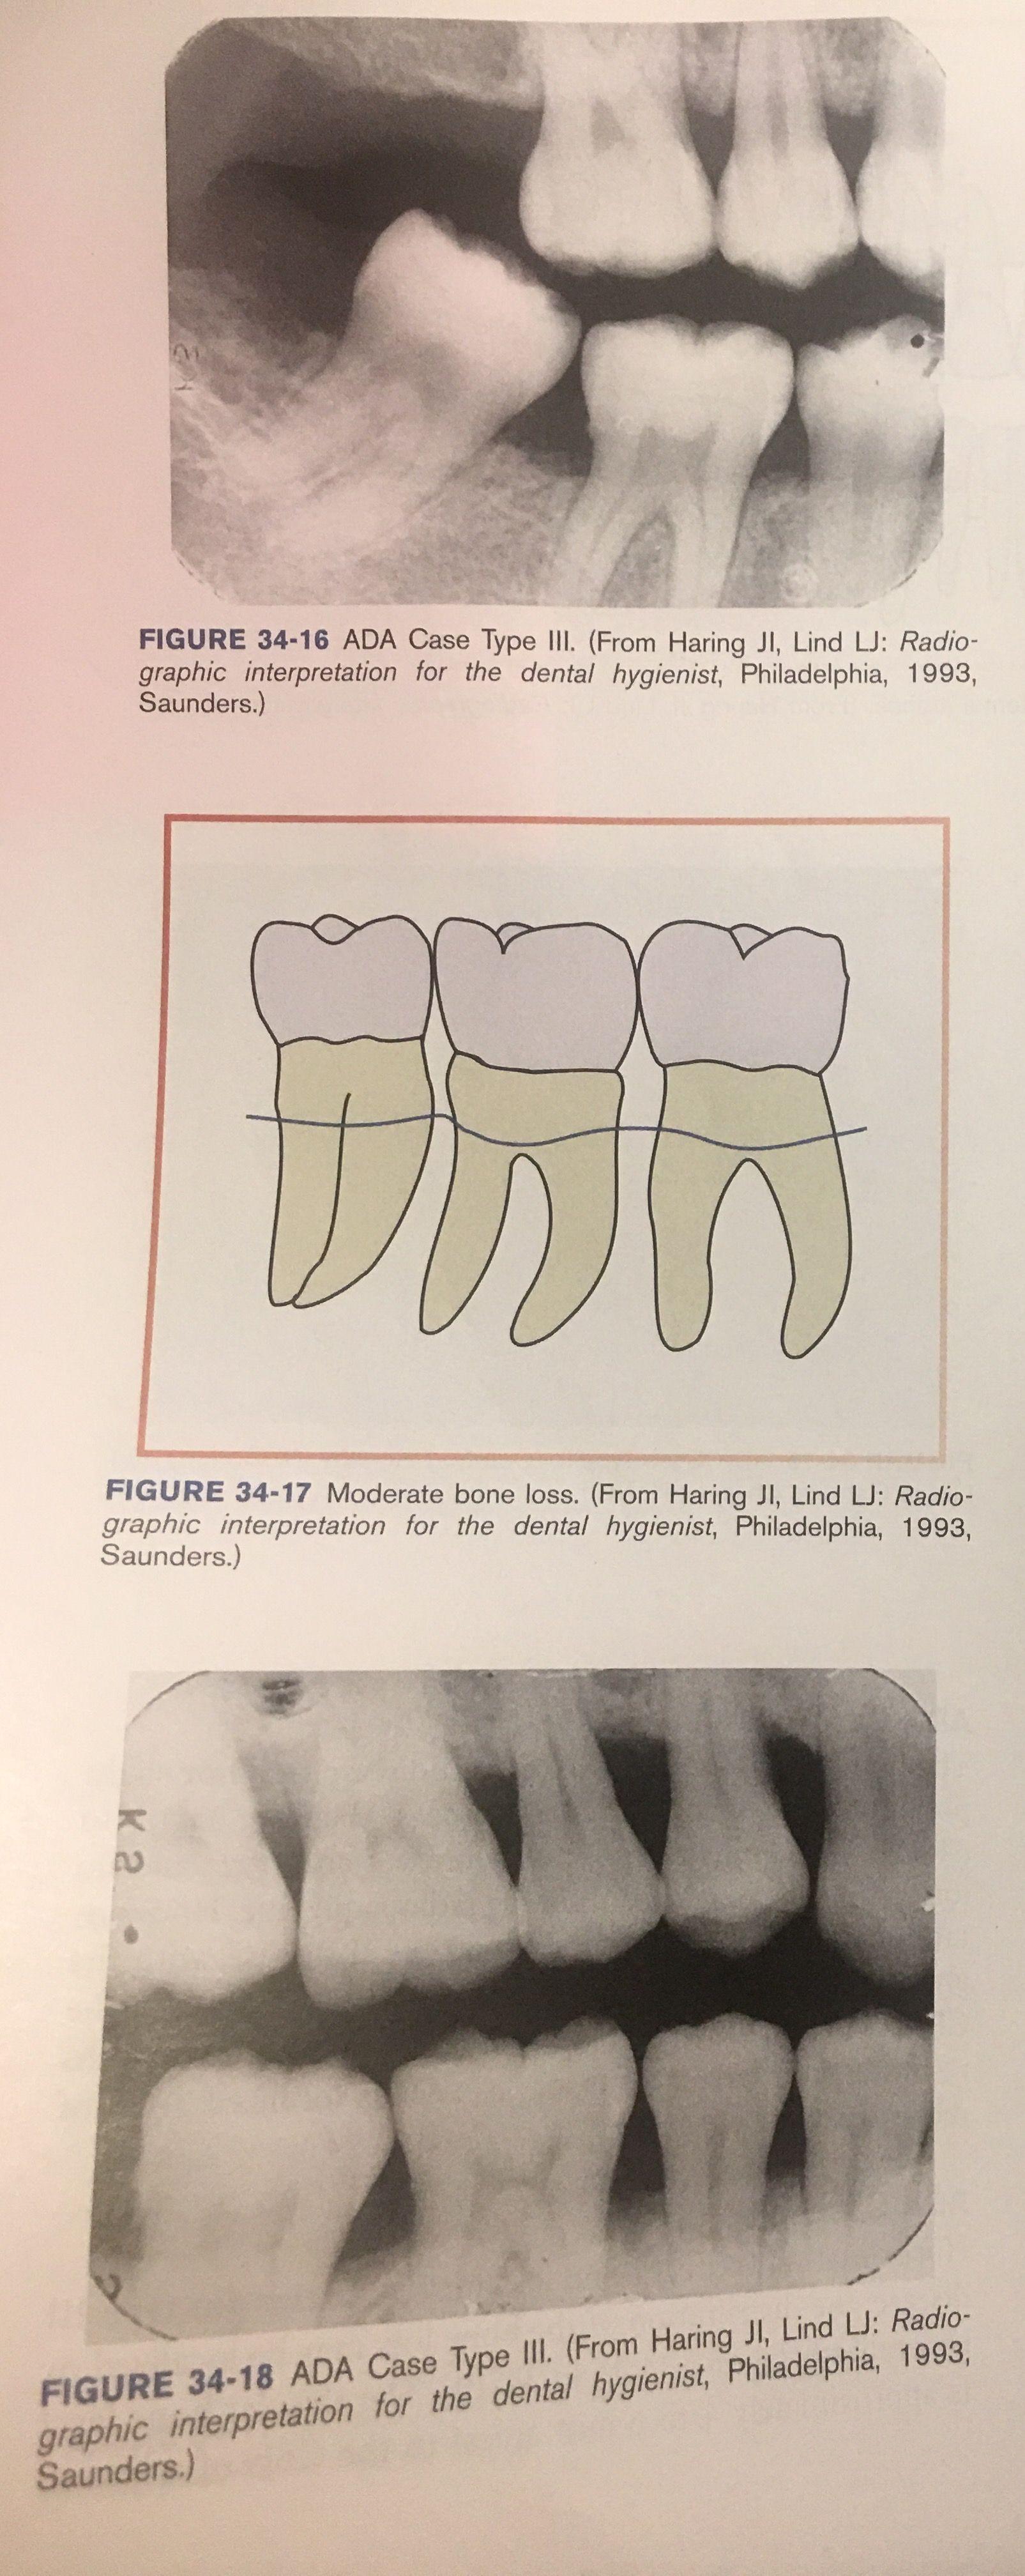 3-4 MM bone loss = Case Type III: Moderate periodontitis ...